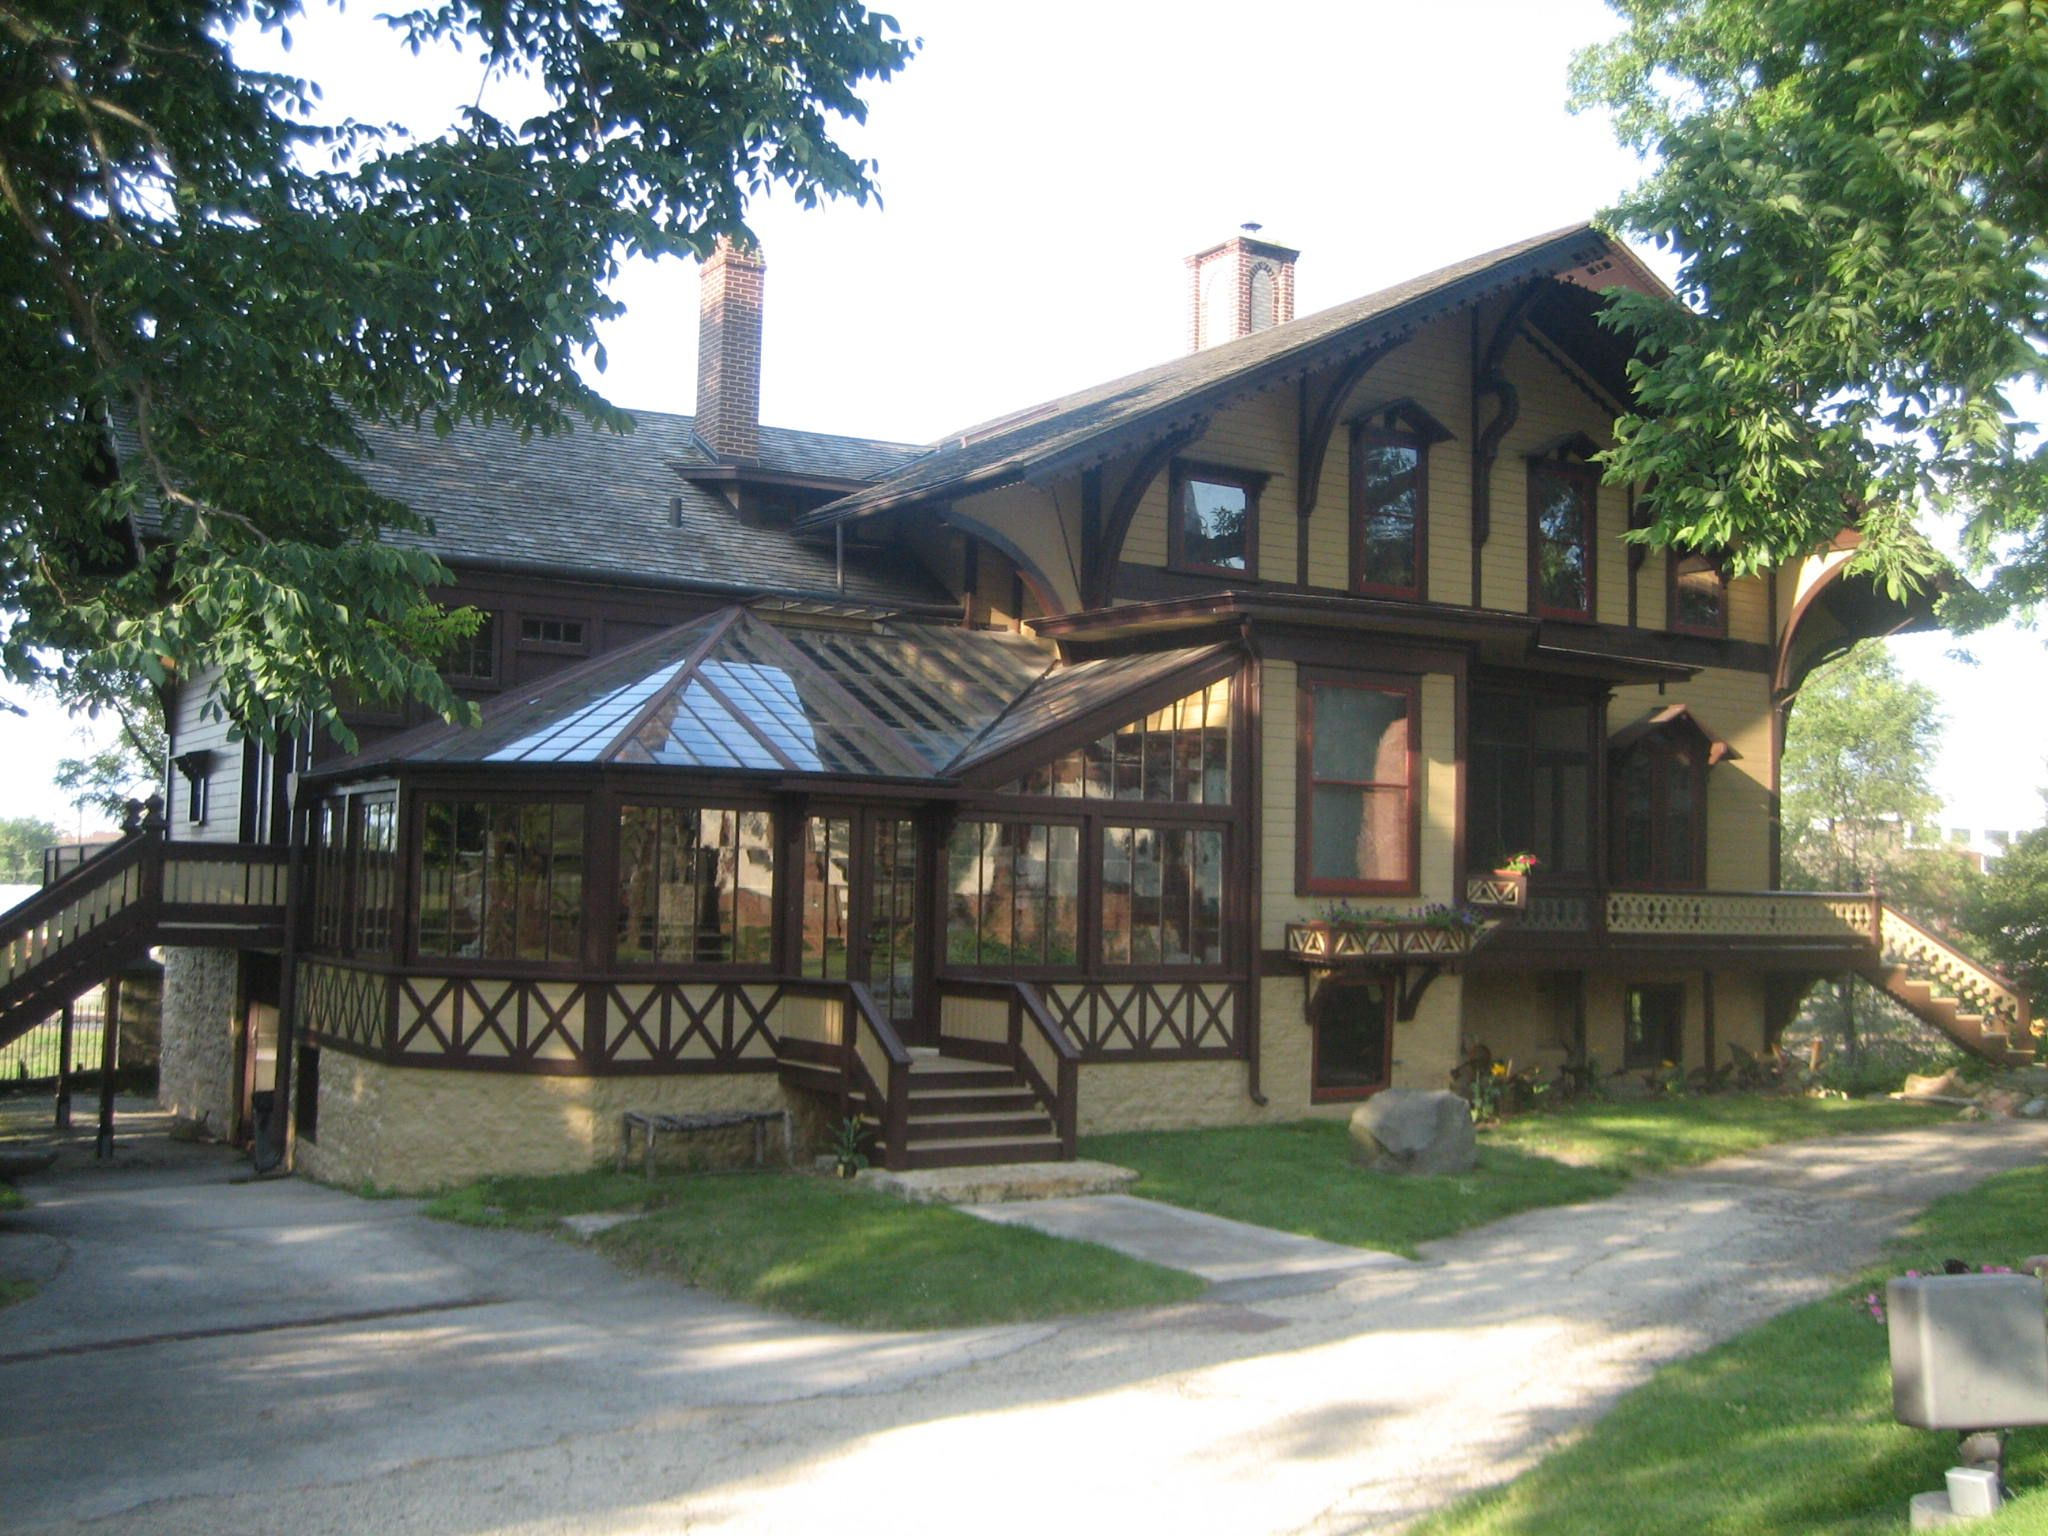 Tinker Swiss Cottage in Rockford, IL | Old Haunts | Pinterest ...